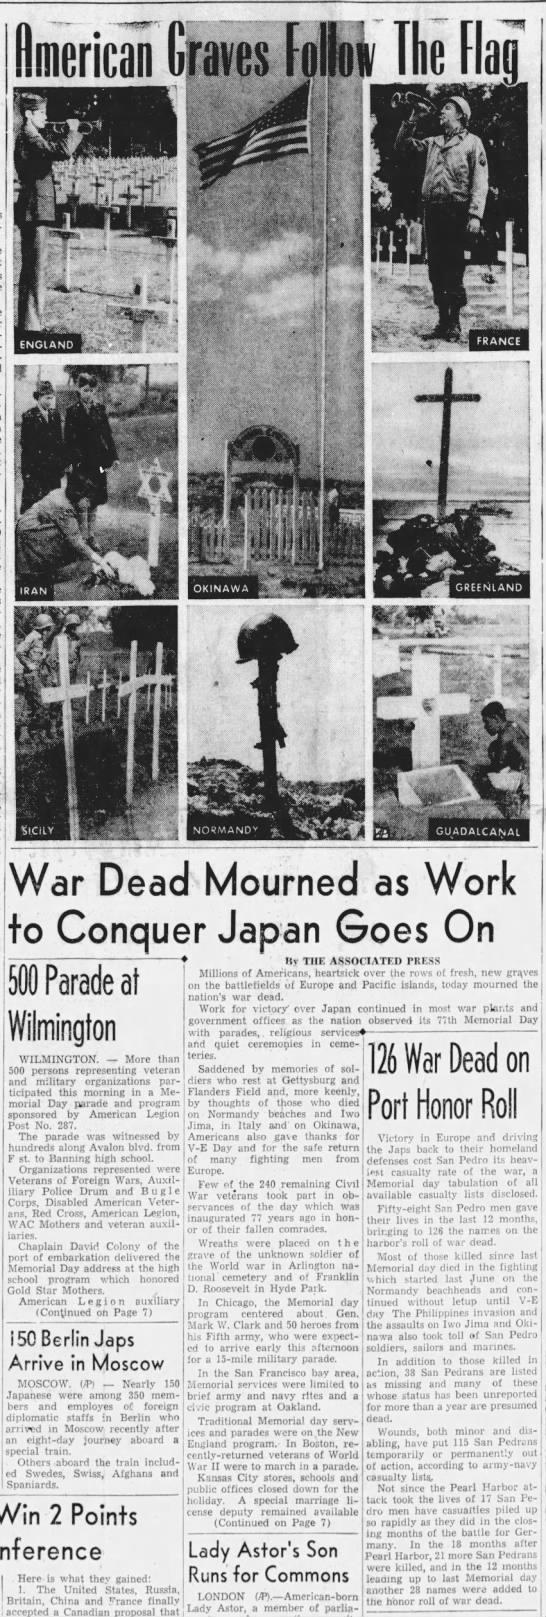 Americans Mourn Around the World -